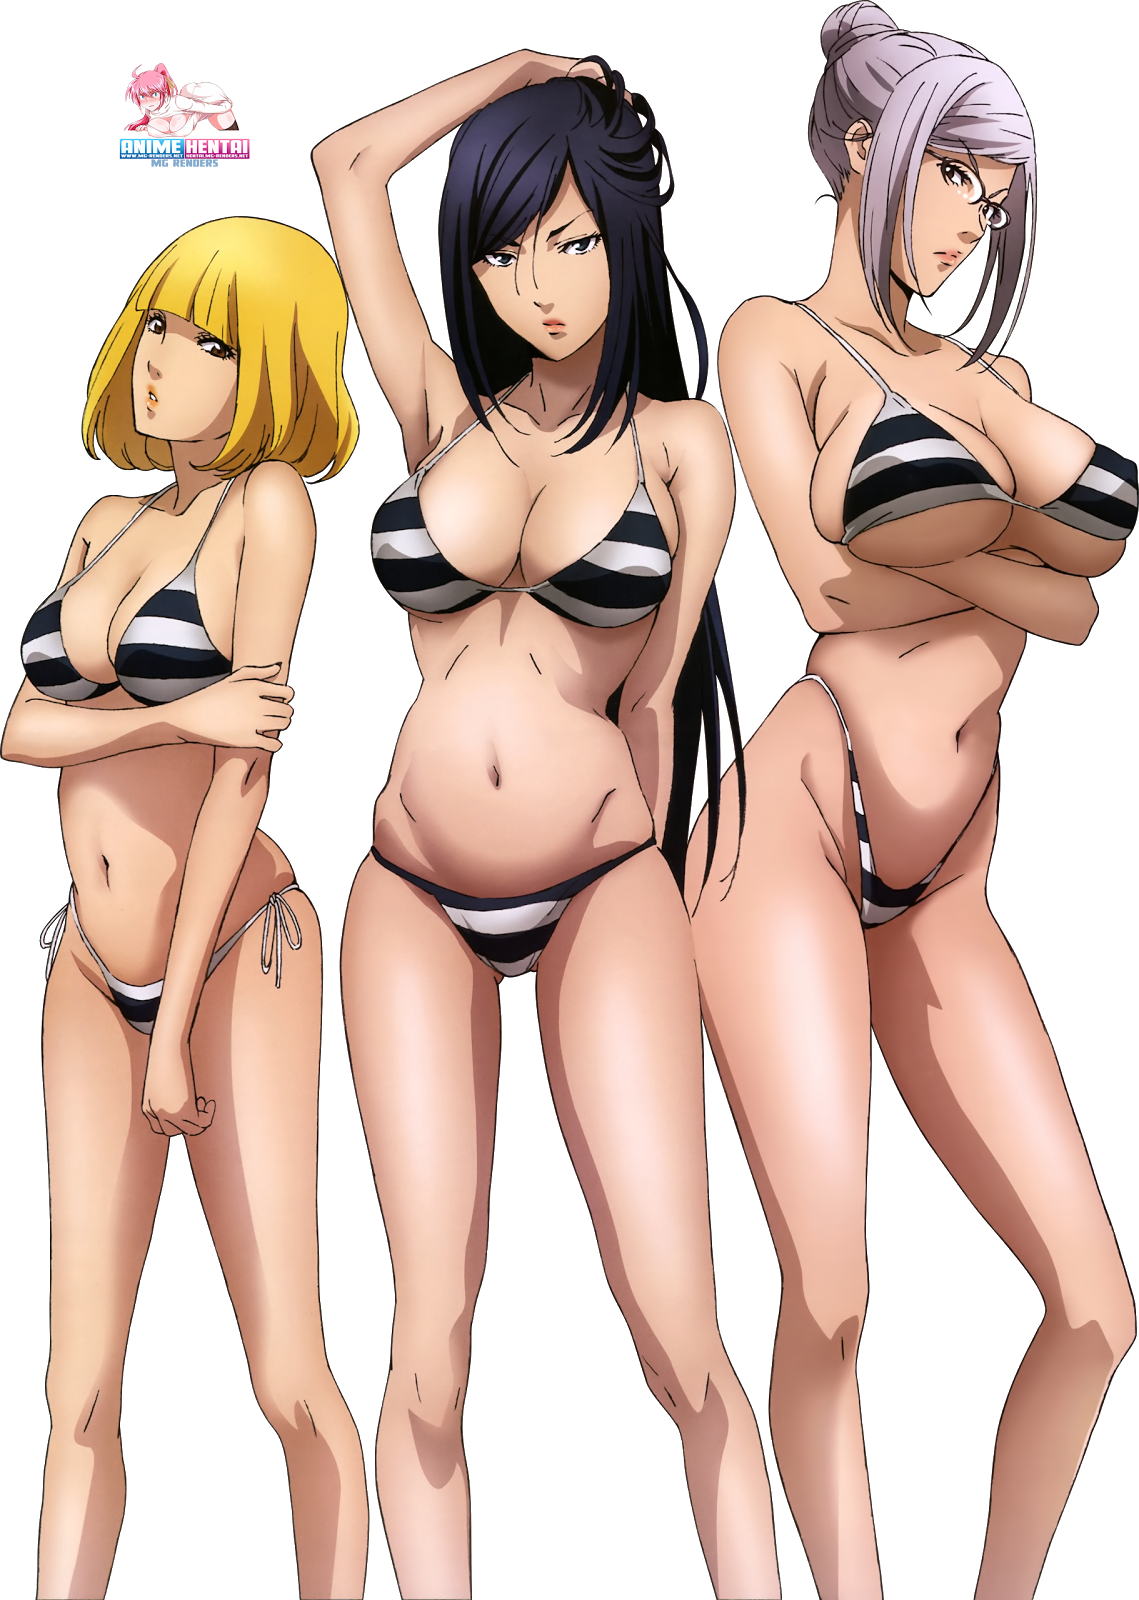 Tags: Anime, Render,  Armpit Fetish,  Huge Breasts,  Kangoku Gakuen,  Kurihara Mari,  Midorikawa Hana,  Prison School,  Shiraki Meiko,  PNG, Image, Picture